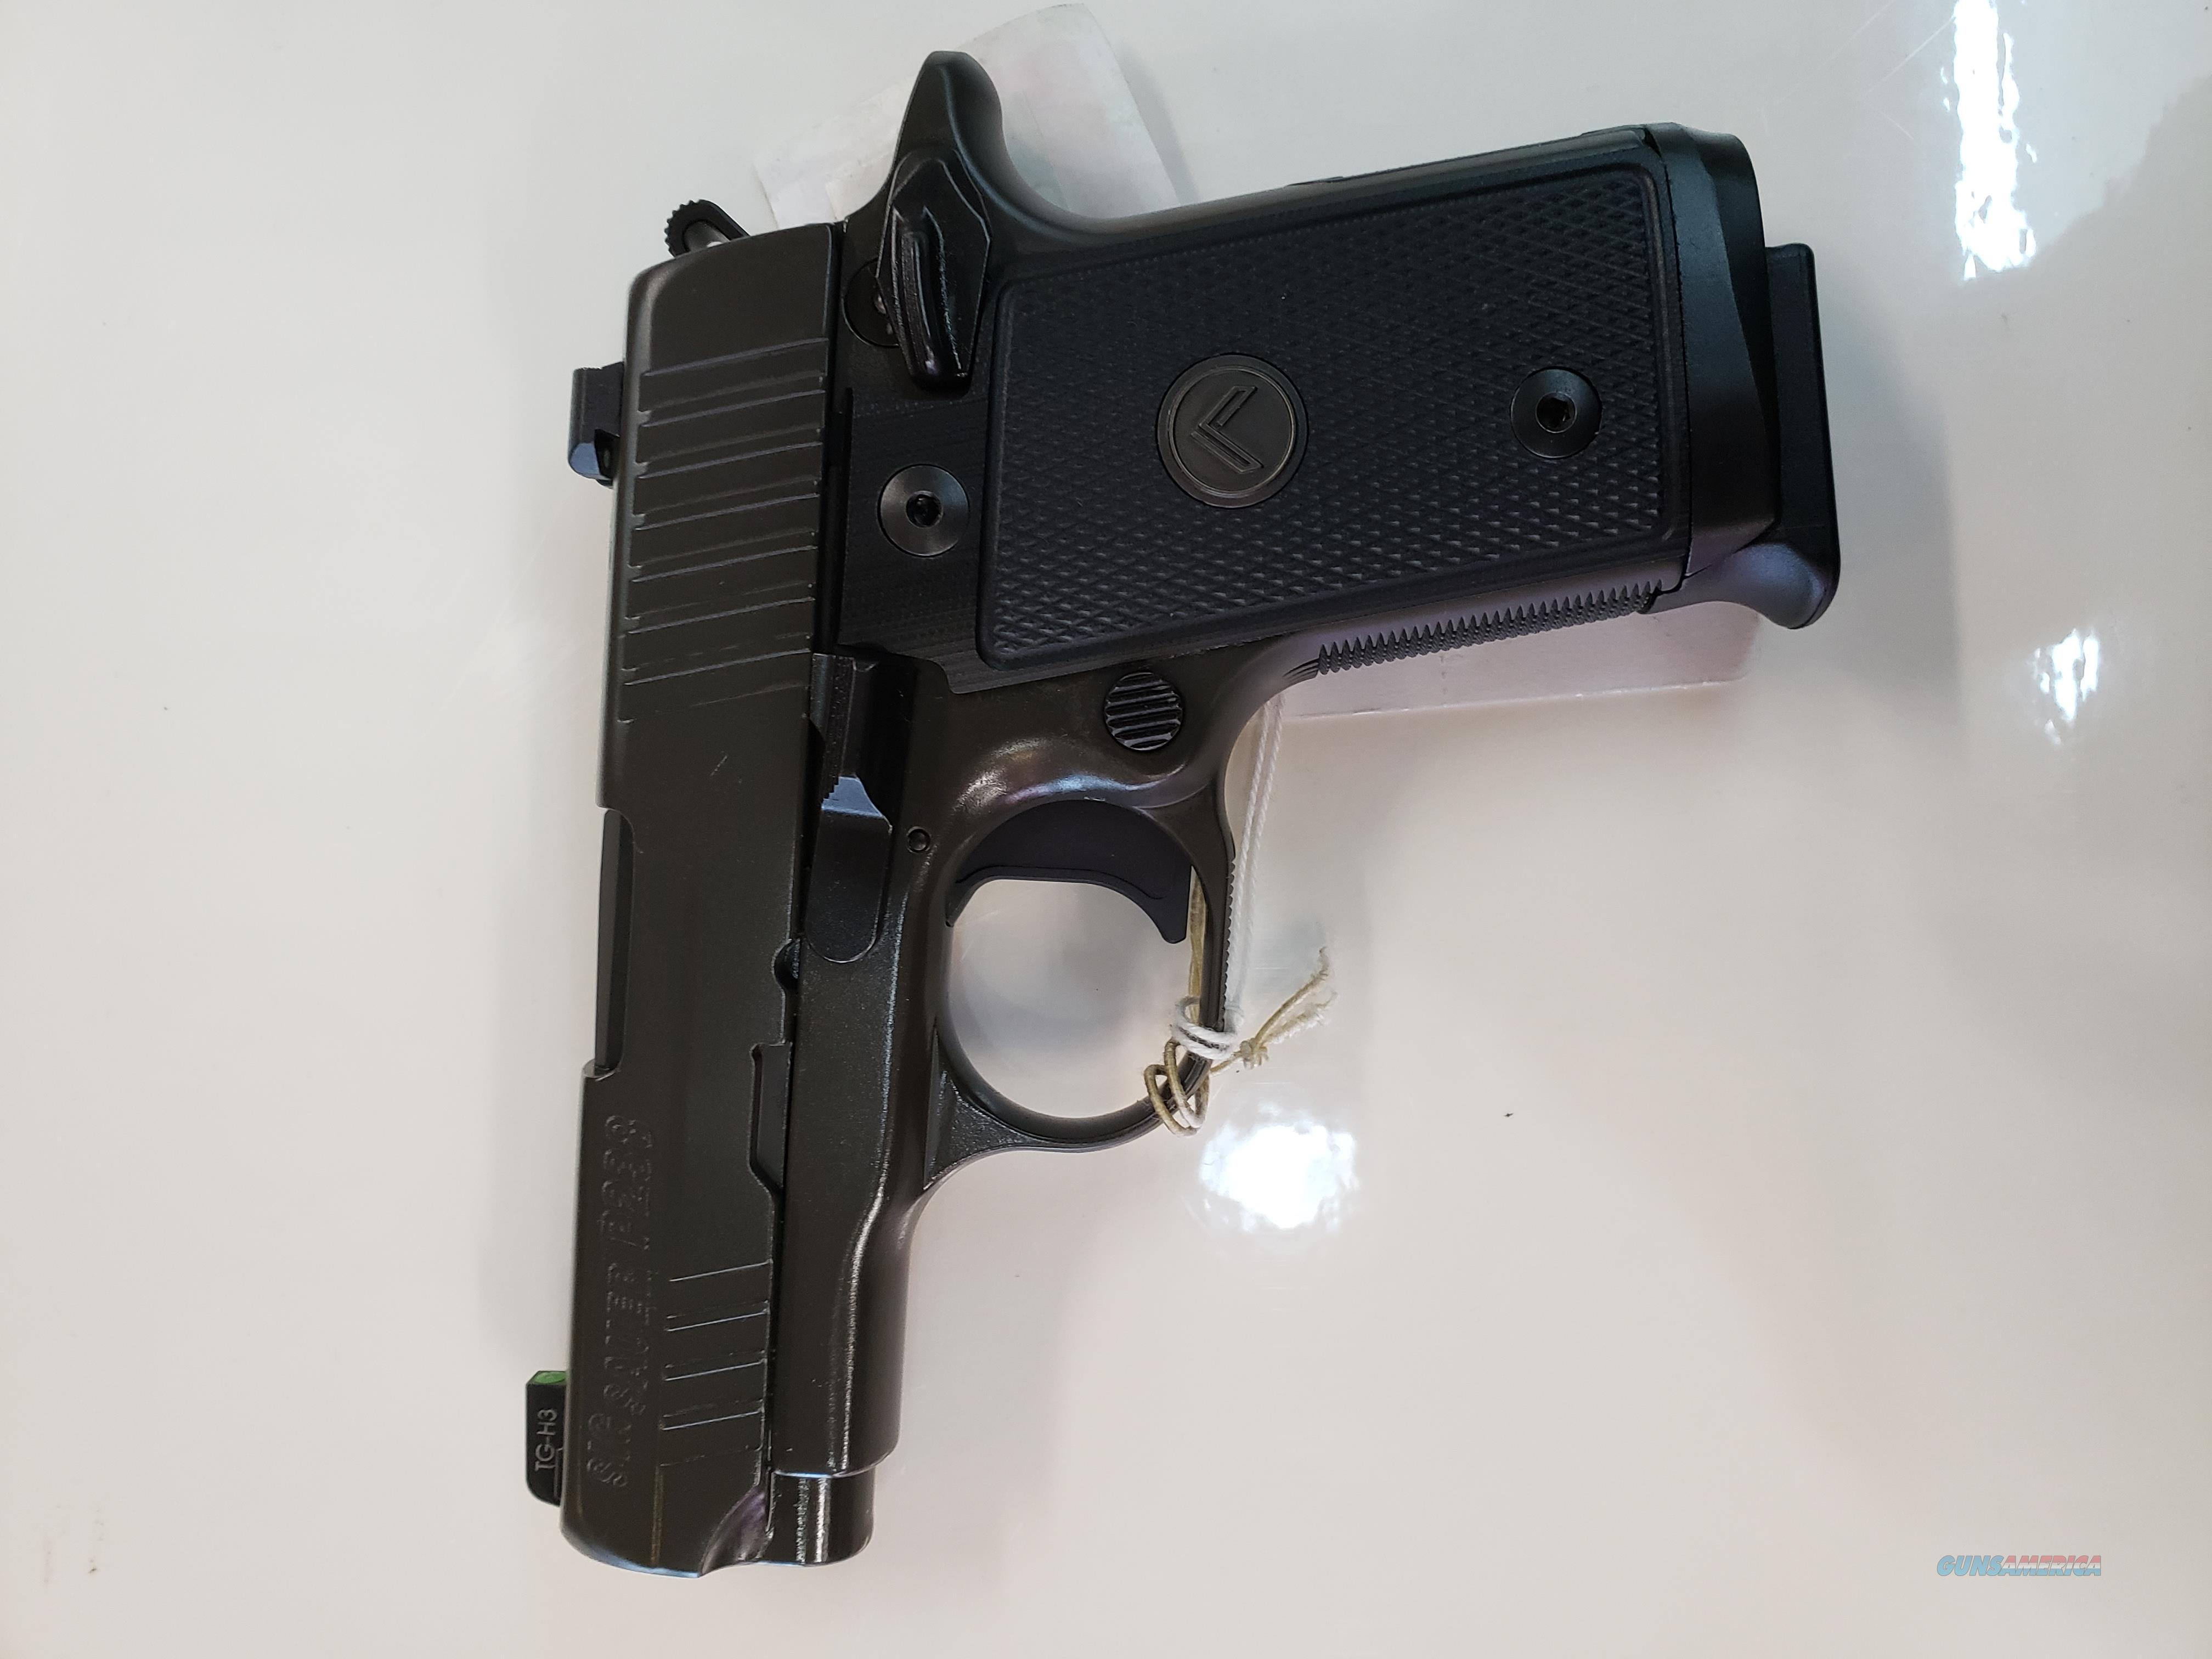 SIG P238 LEGION  Guns > Pistols > Sig - Sauer/Sigarms Pistols > P238